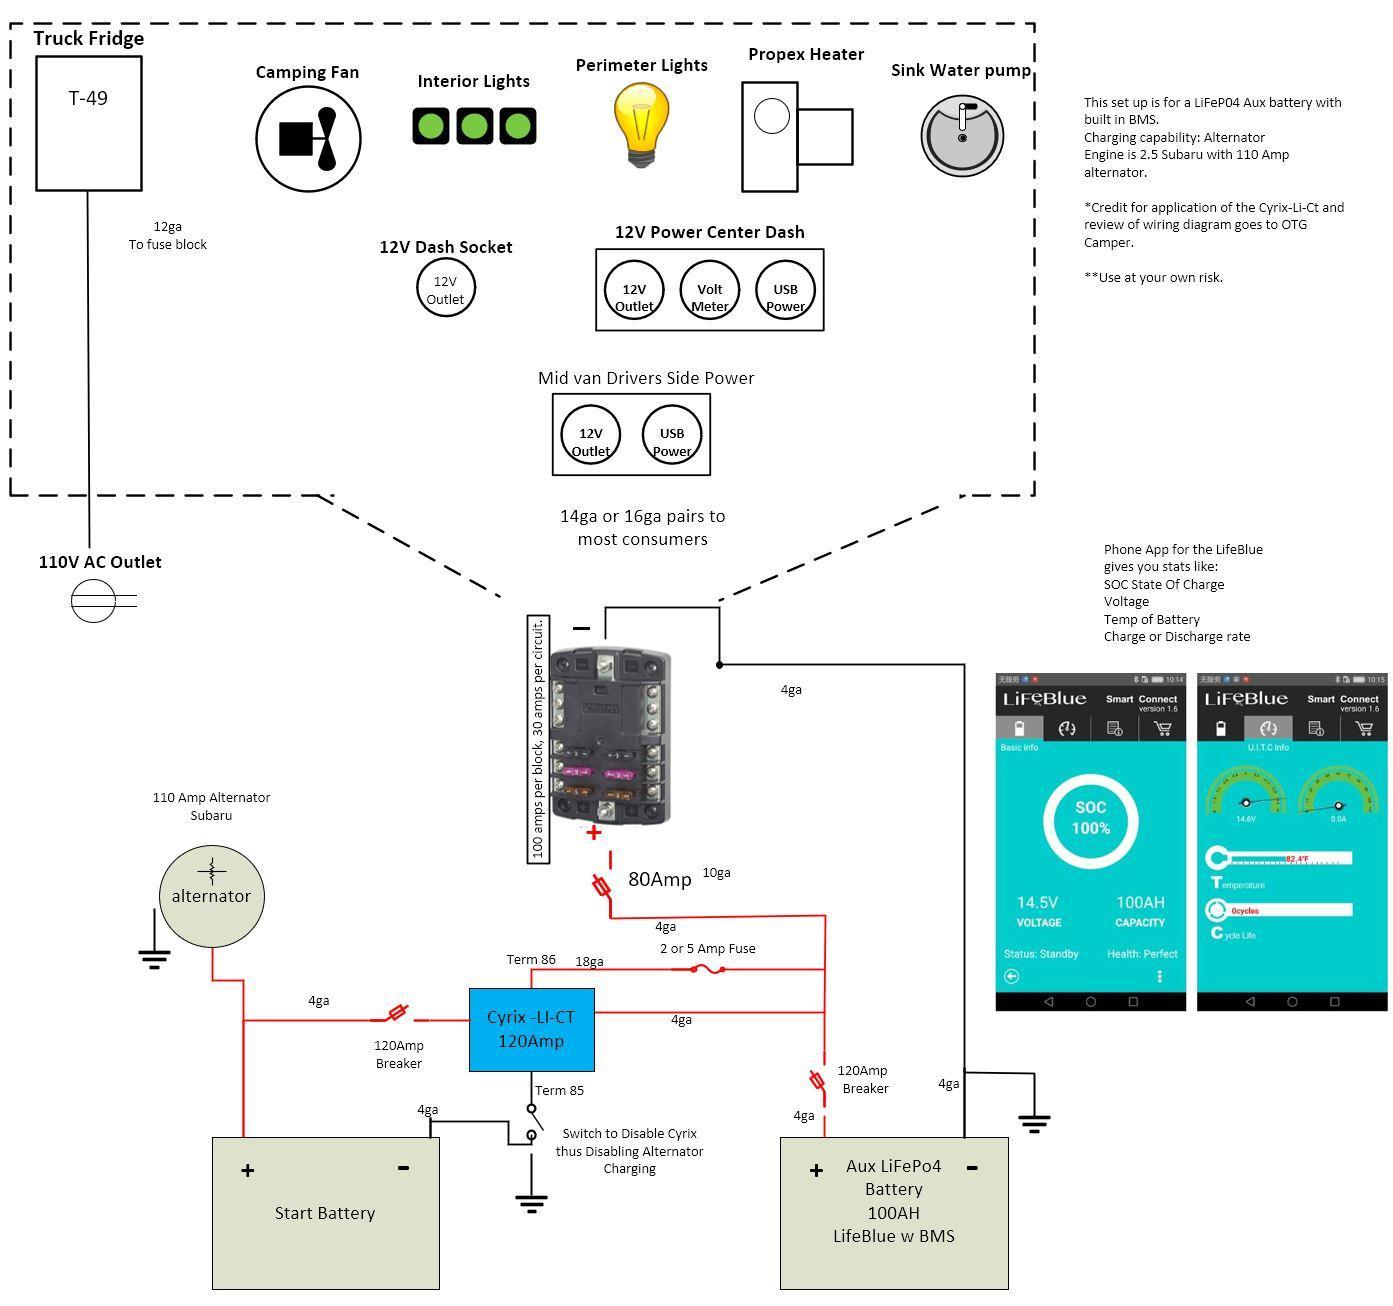 Gallery Lifepo4 Aux Battery Wiring Diagram Wire Alternator Charging W Lifeblue Batt